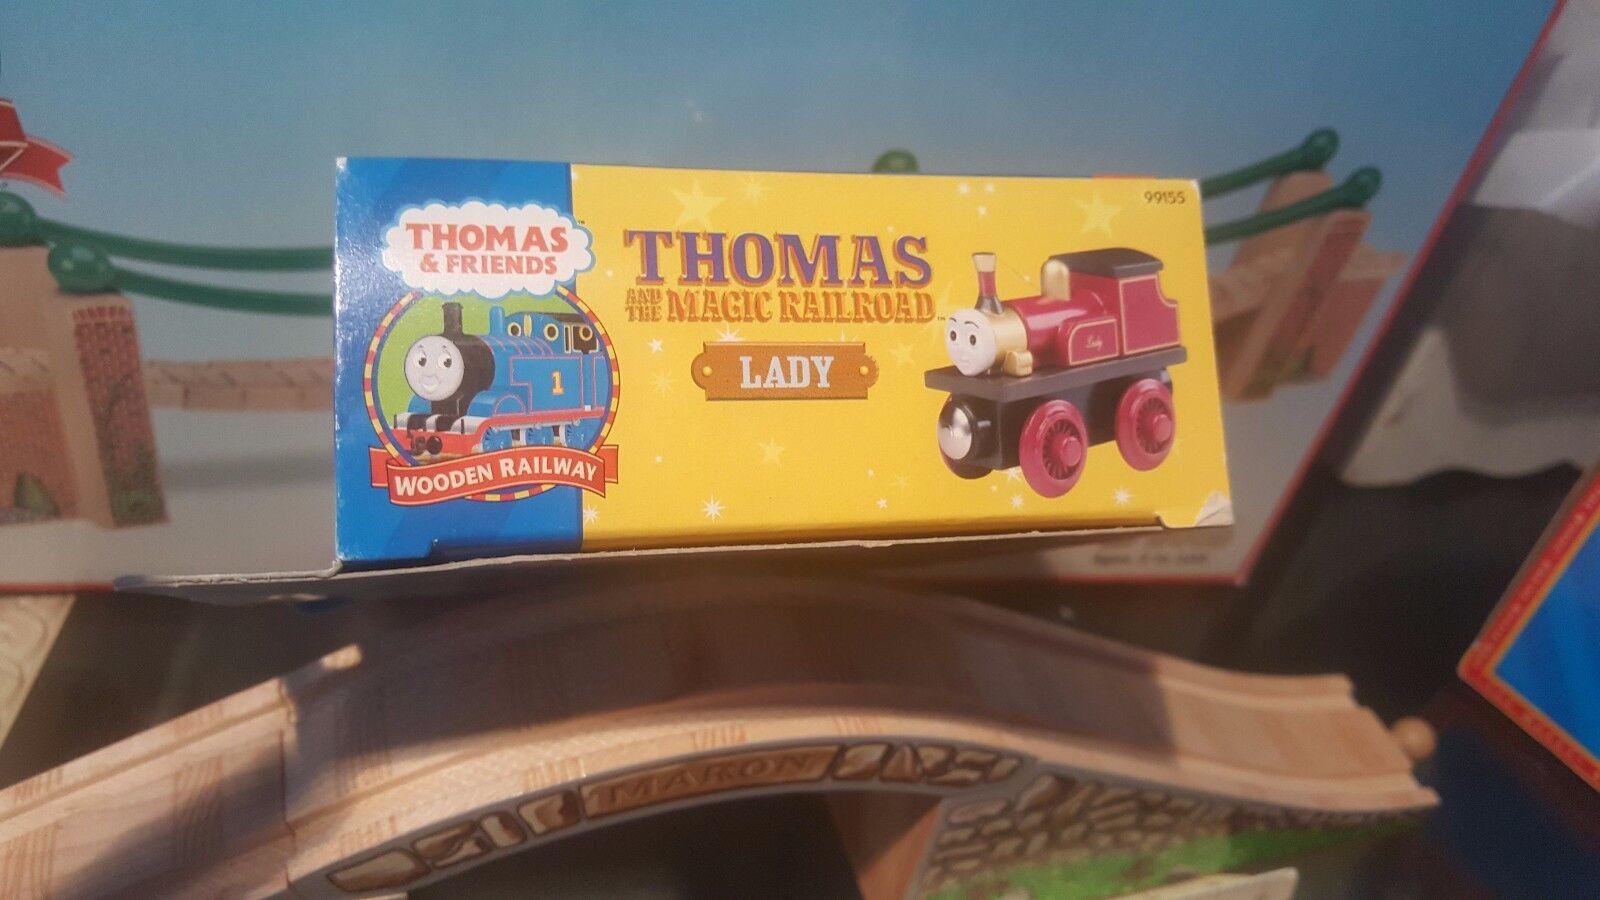 THOMAS & FRIENDS WOODEN RAILWAY  LADY RETIROT  LC99155 RARE RETIROT LADY MAGIC RAILROAD d8893b